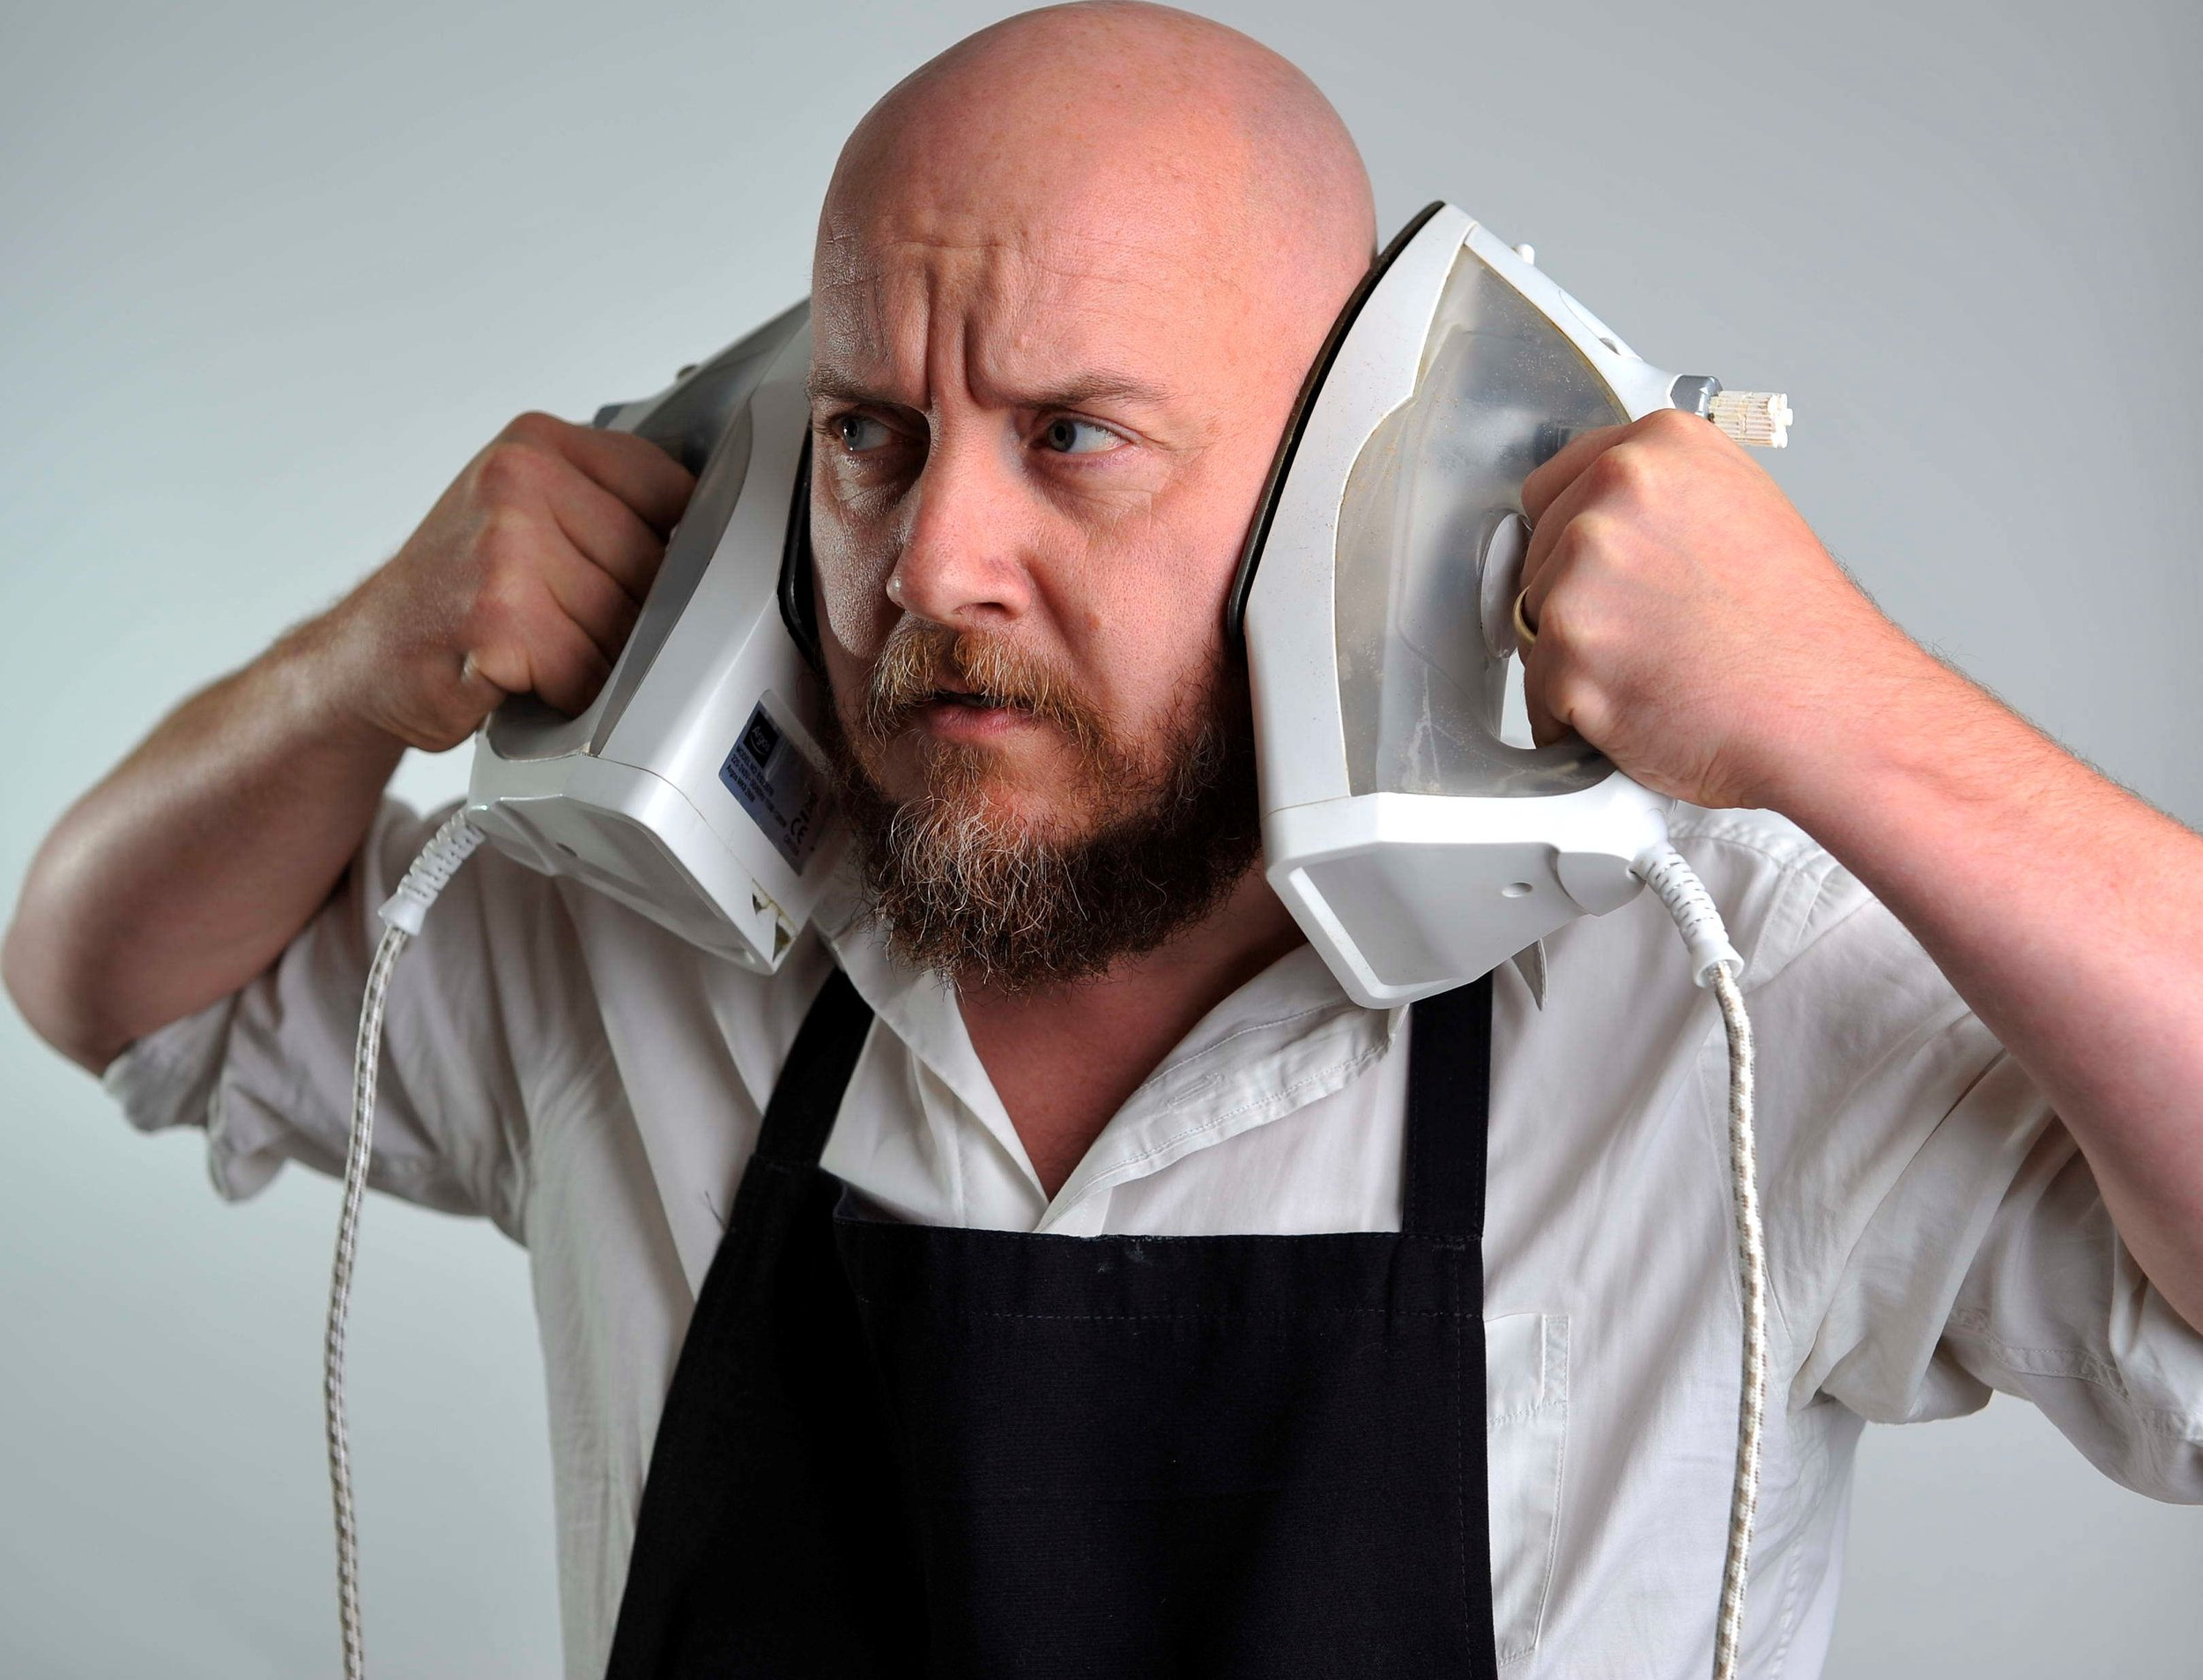 George-photo-irons-head.jpeg